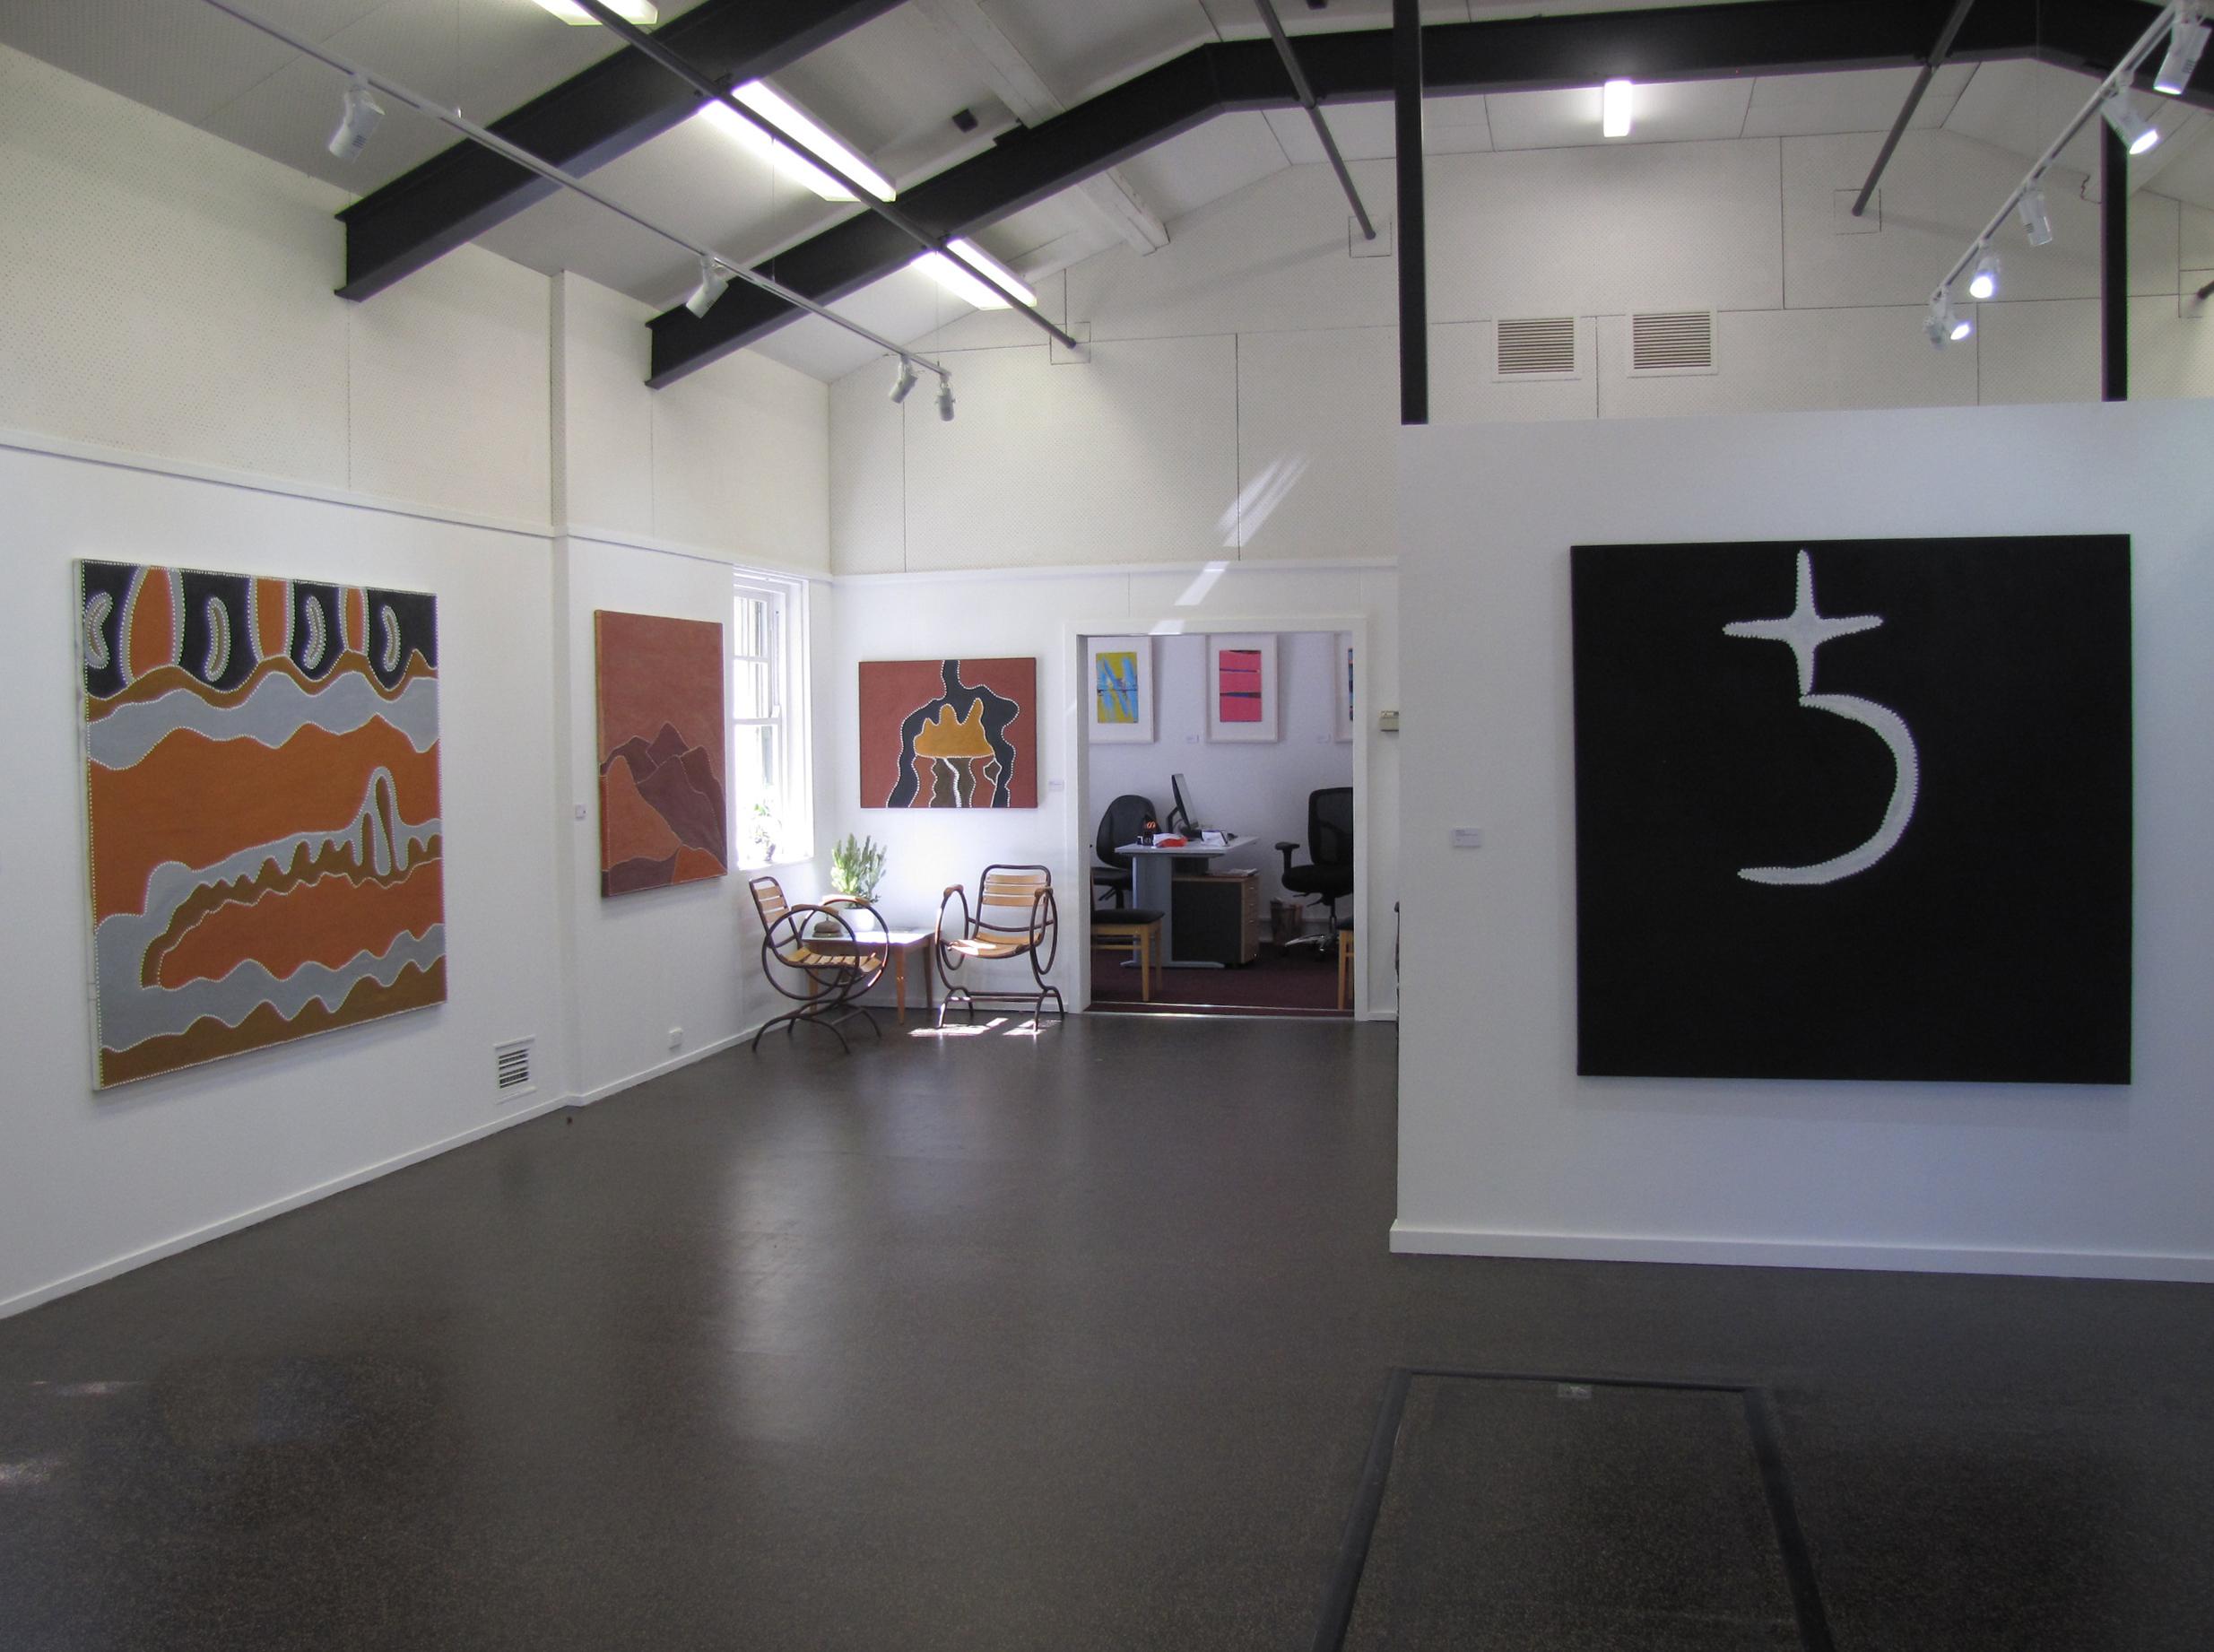 NSG. Warmun 5 exhibition. Exhibition views 2.jpg